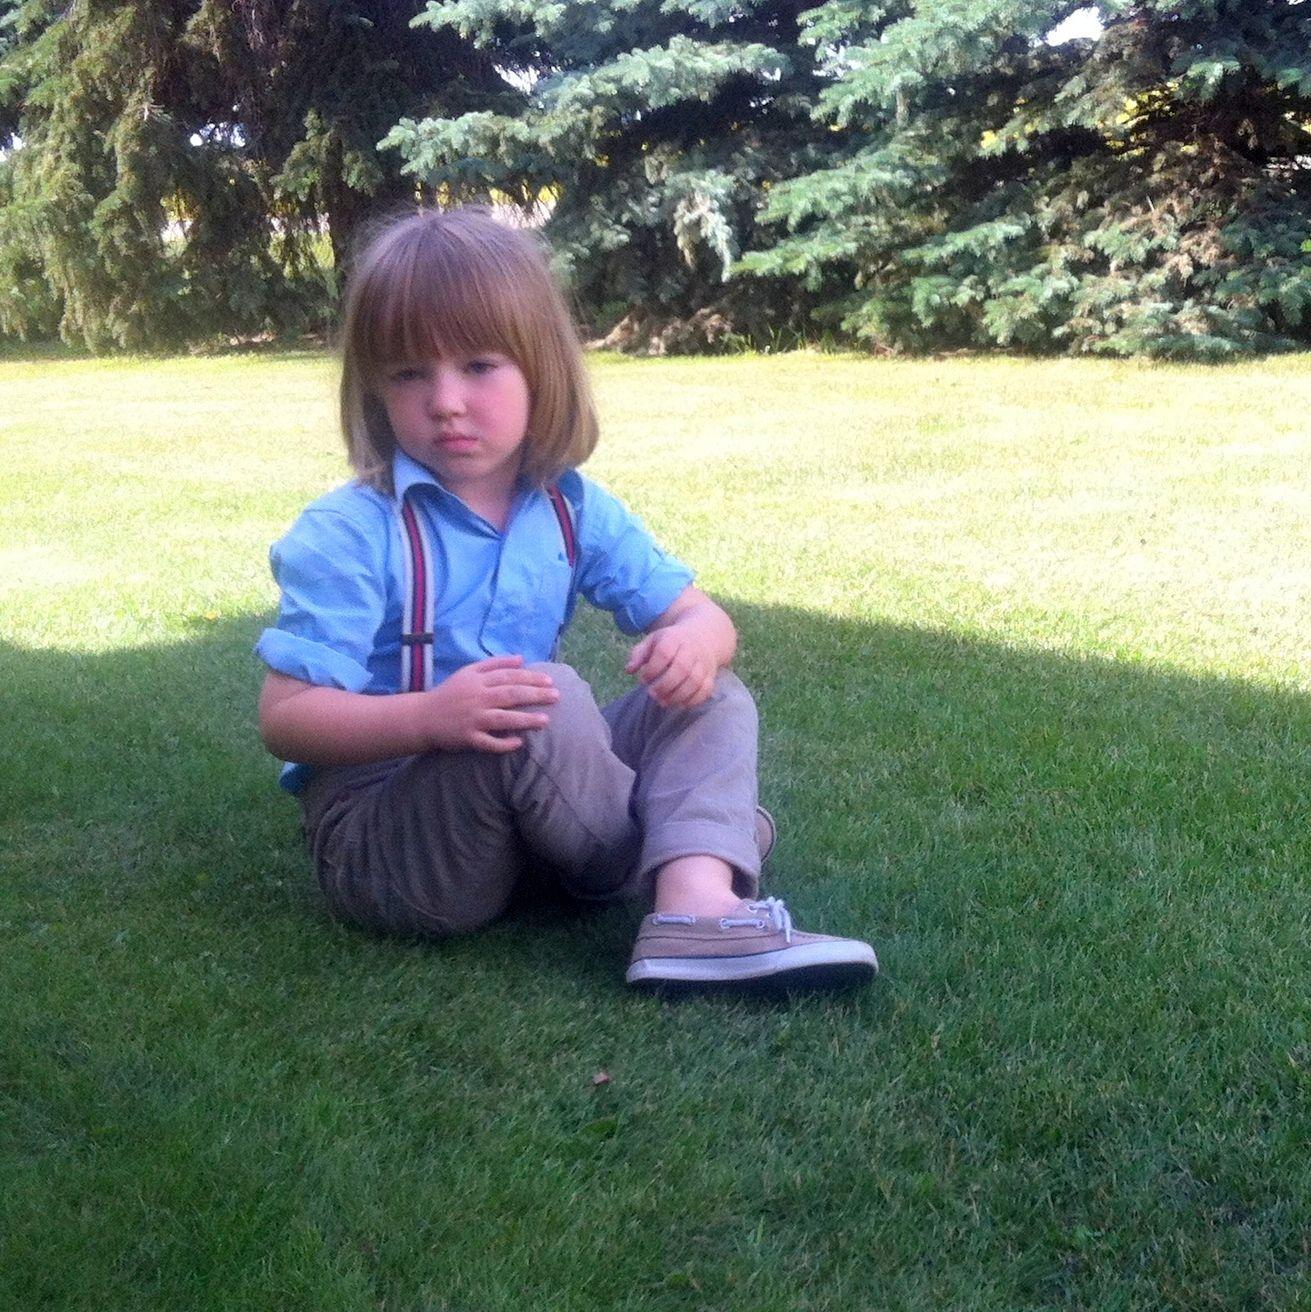 Little boy style. Shirt:American exchange, Suspenders: Mexx, Cords: Zara, Shoes: Ralph Lauren